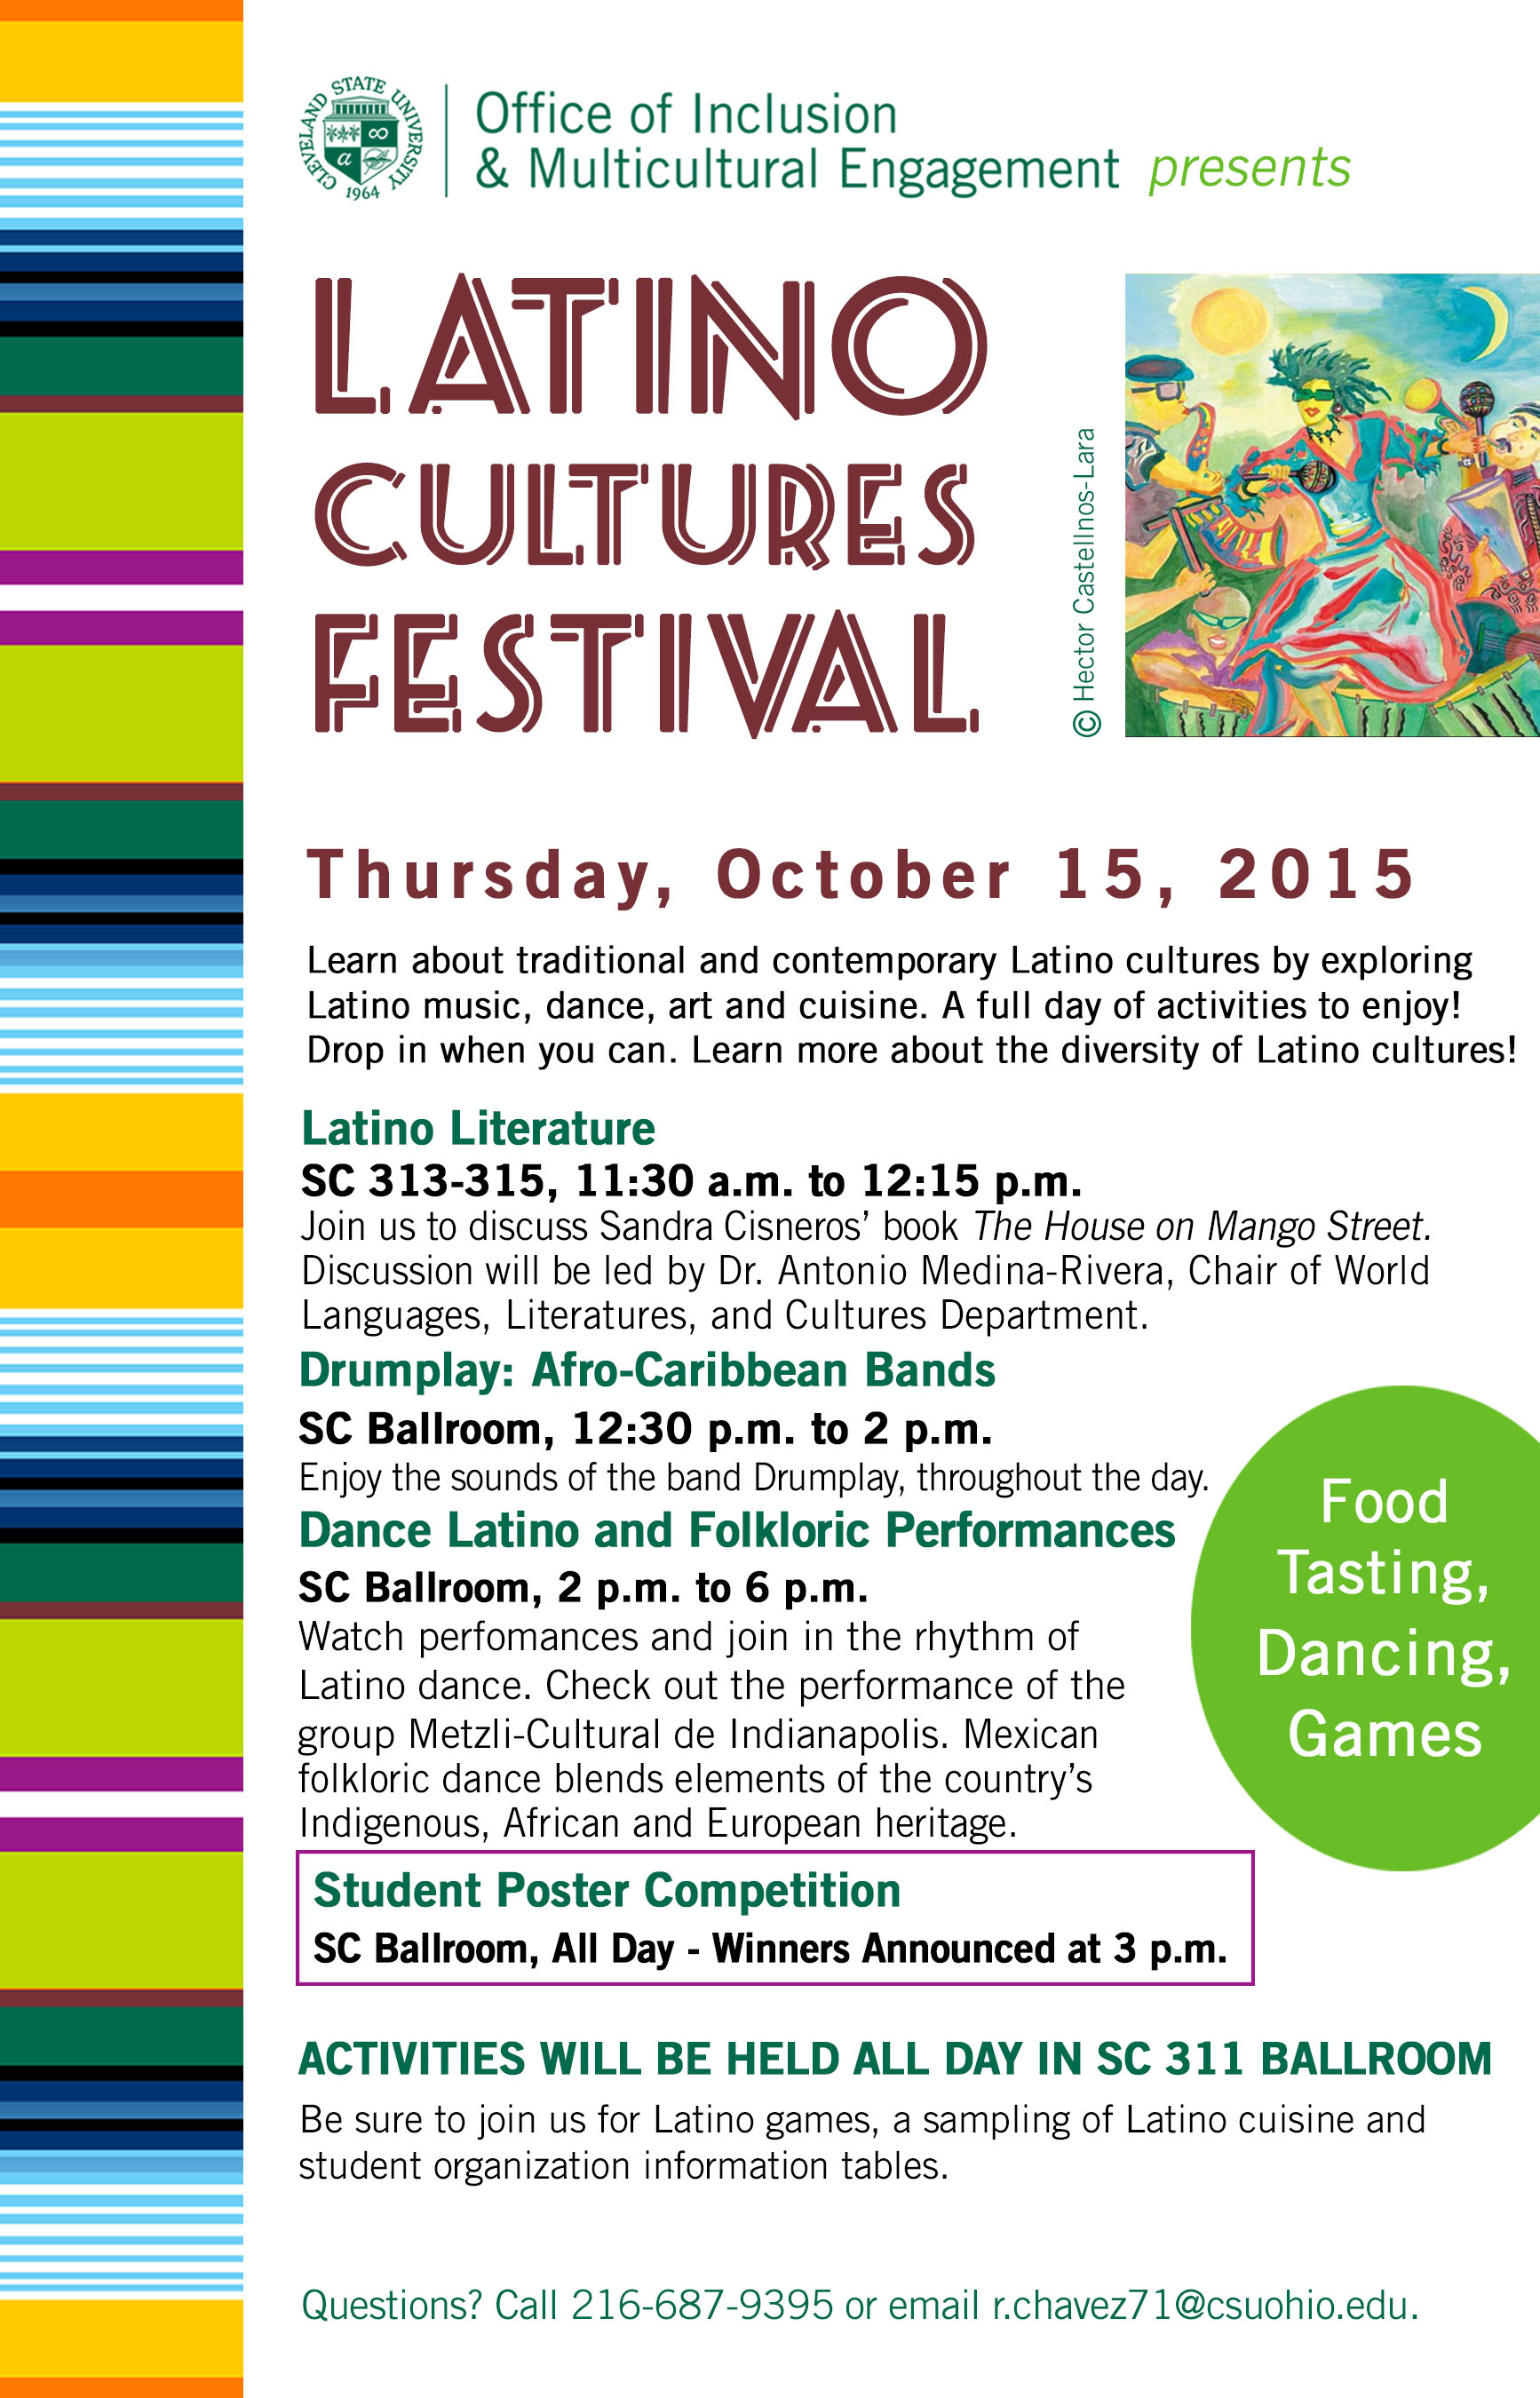 Latino Cultures 2015